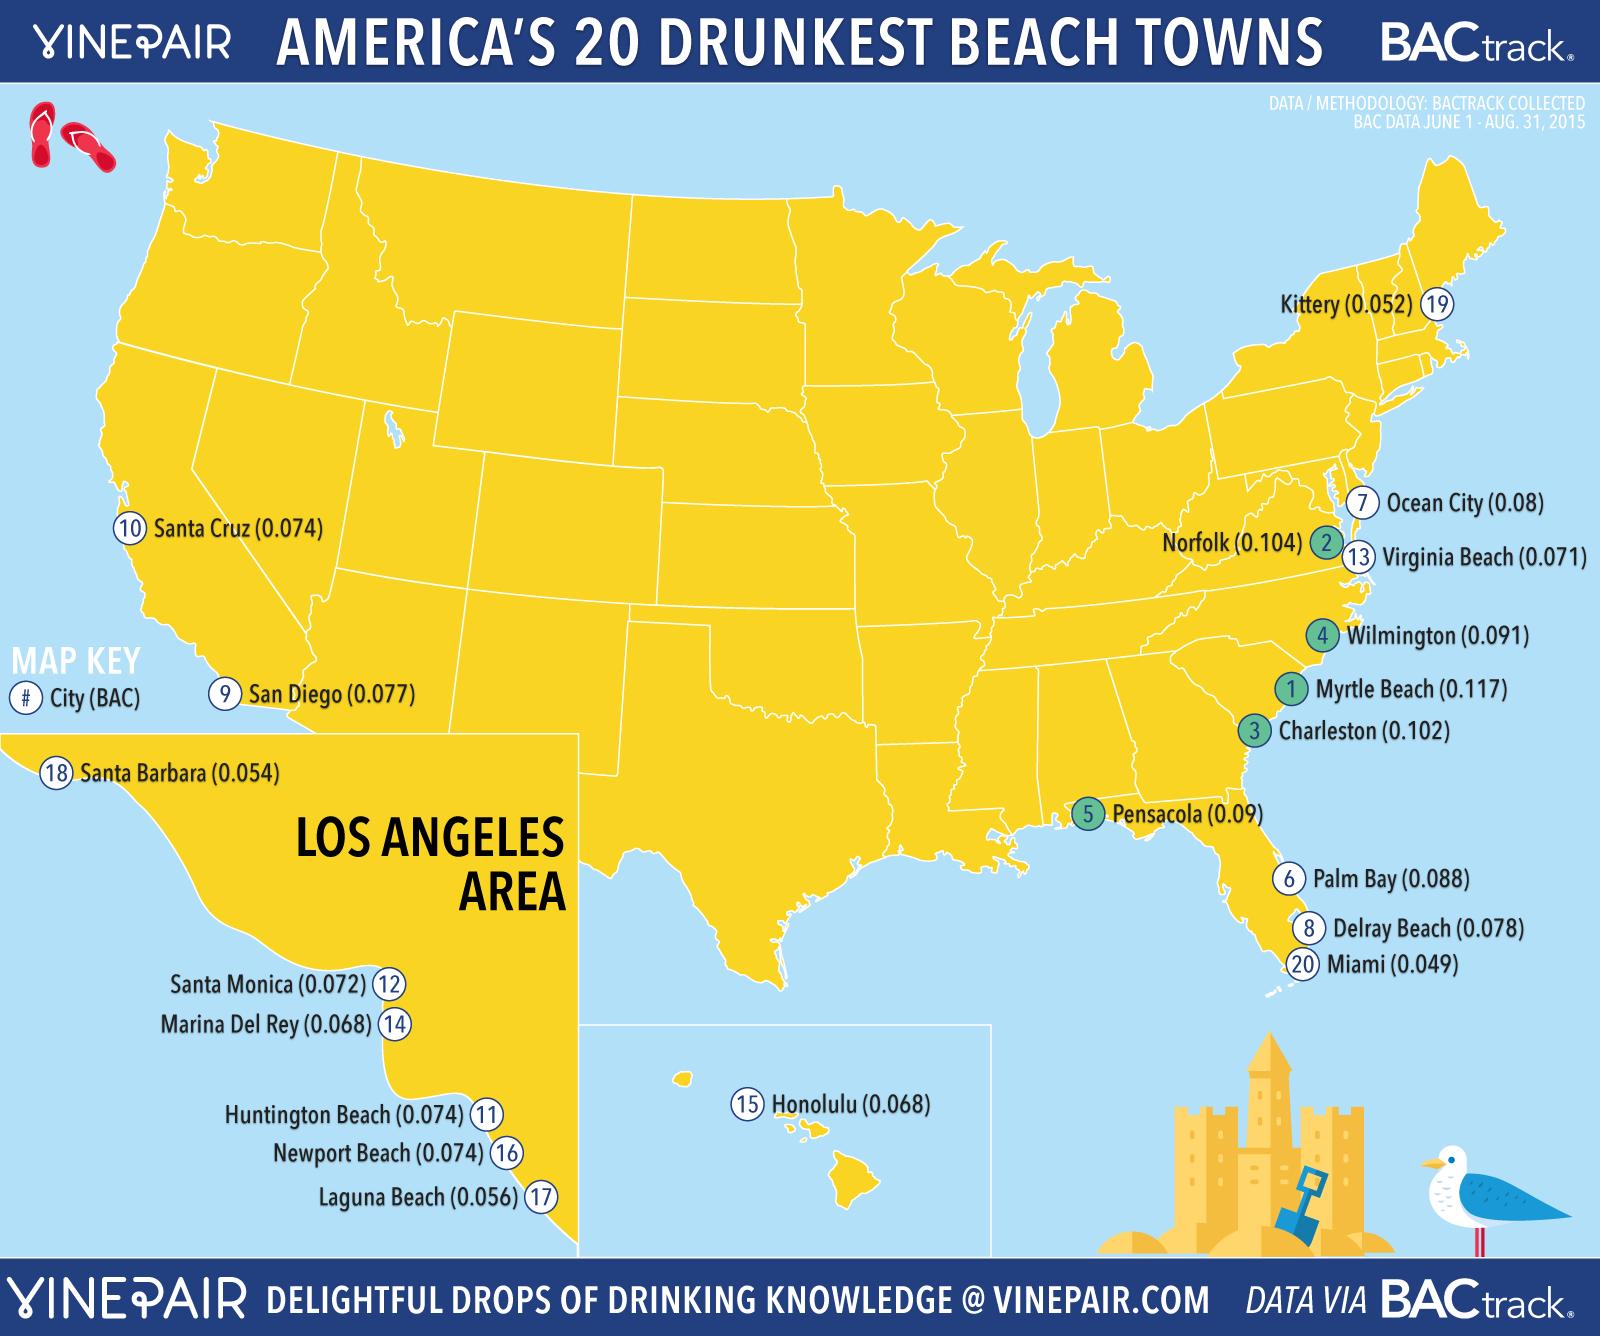 Drunkest Beach Towns In America